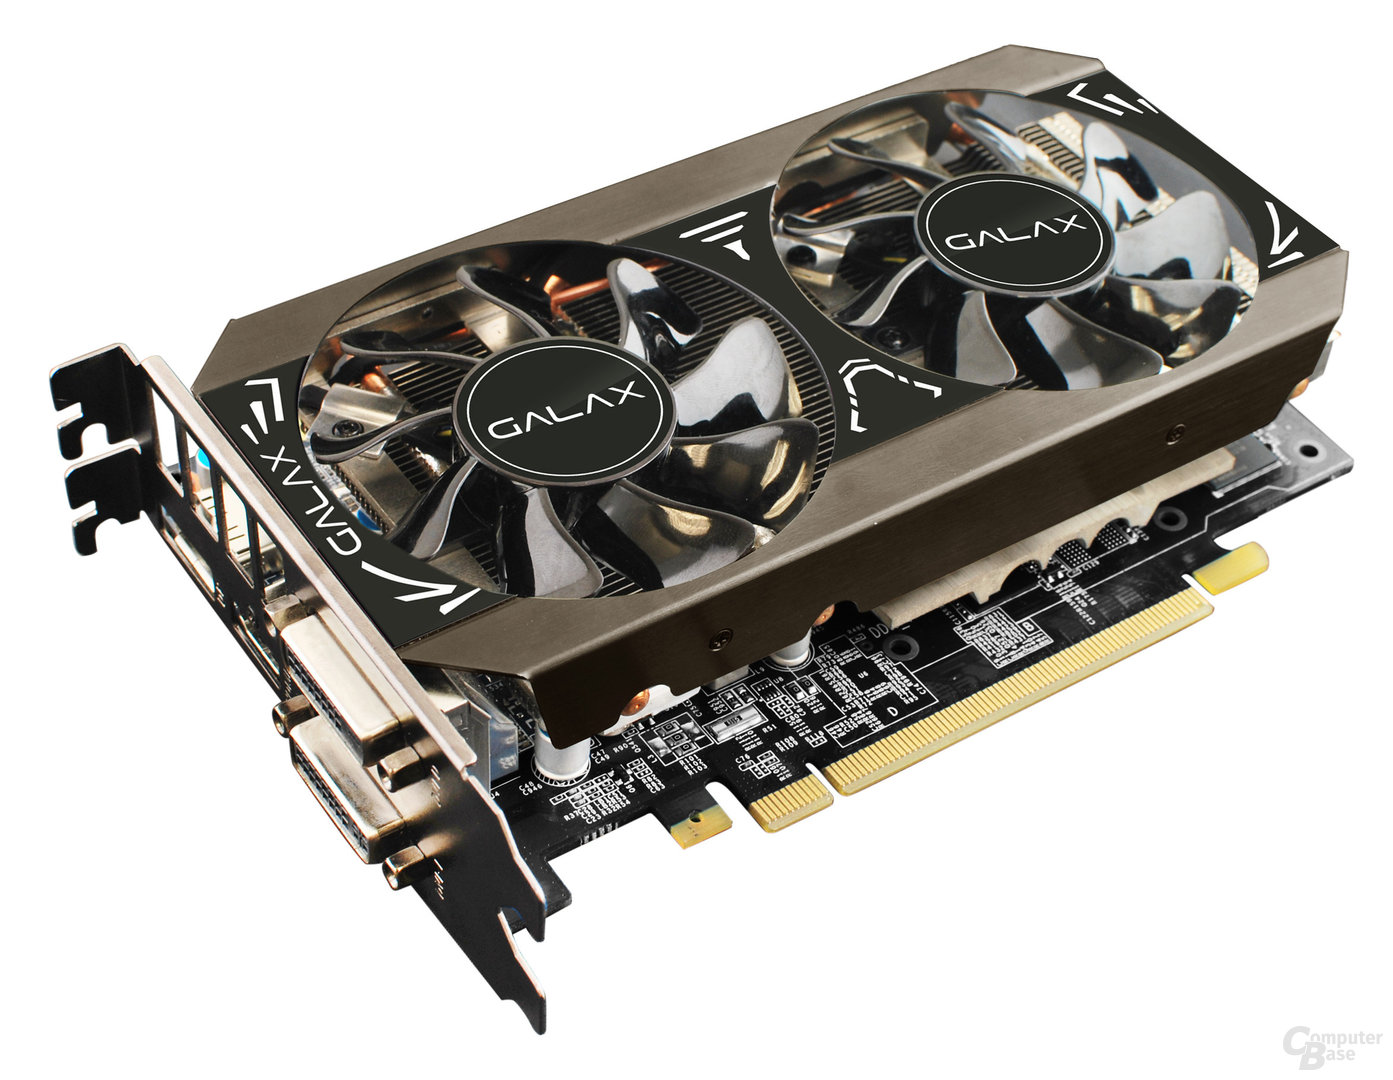 Galax GeForce GTX 970 Gamer OC